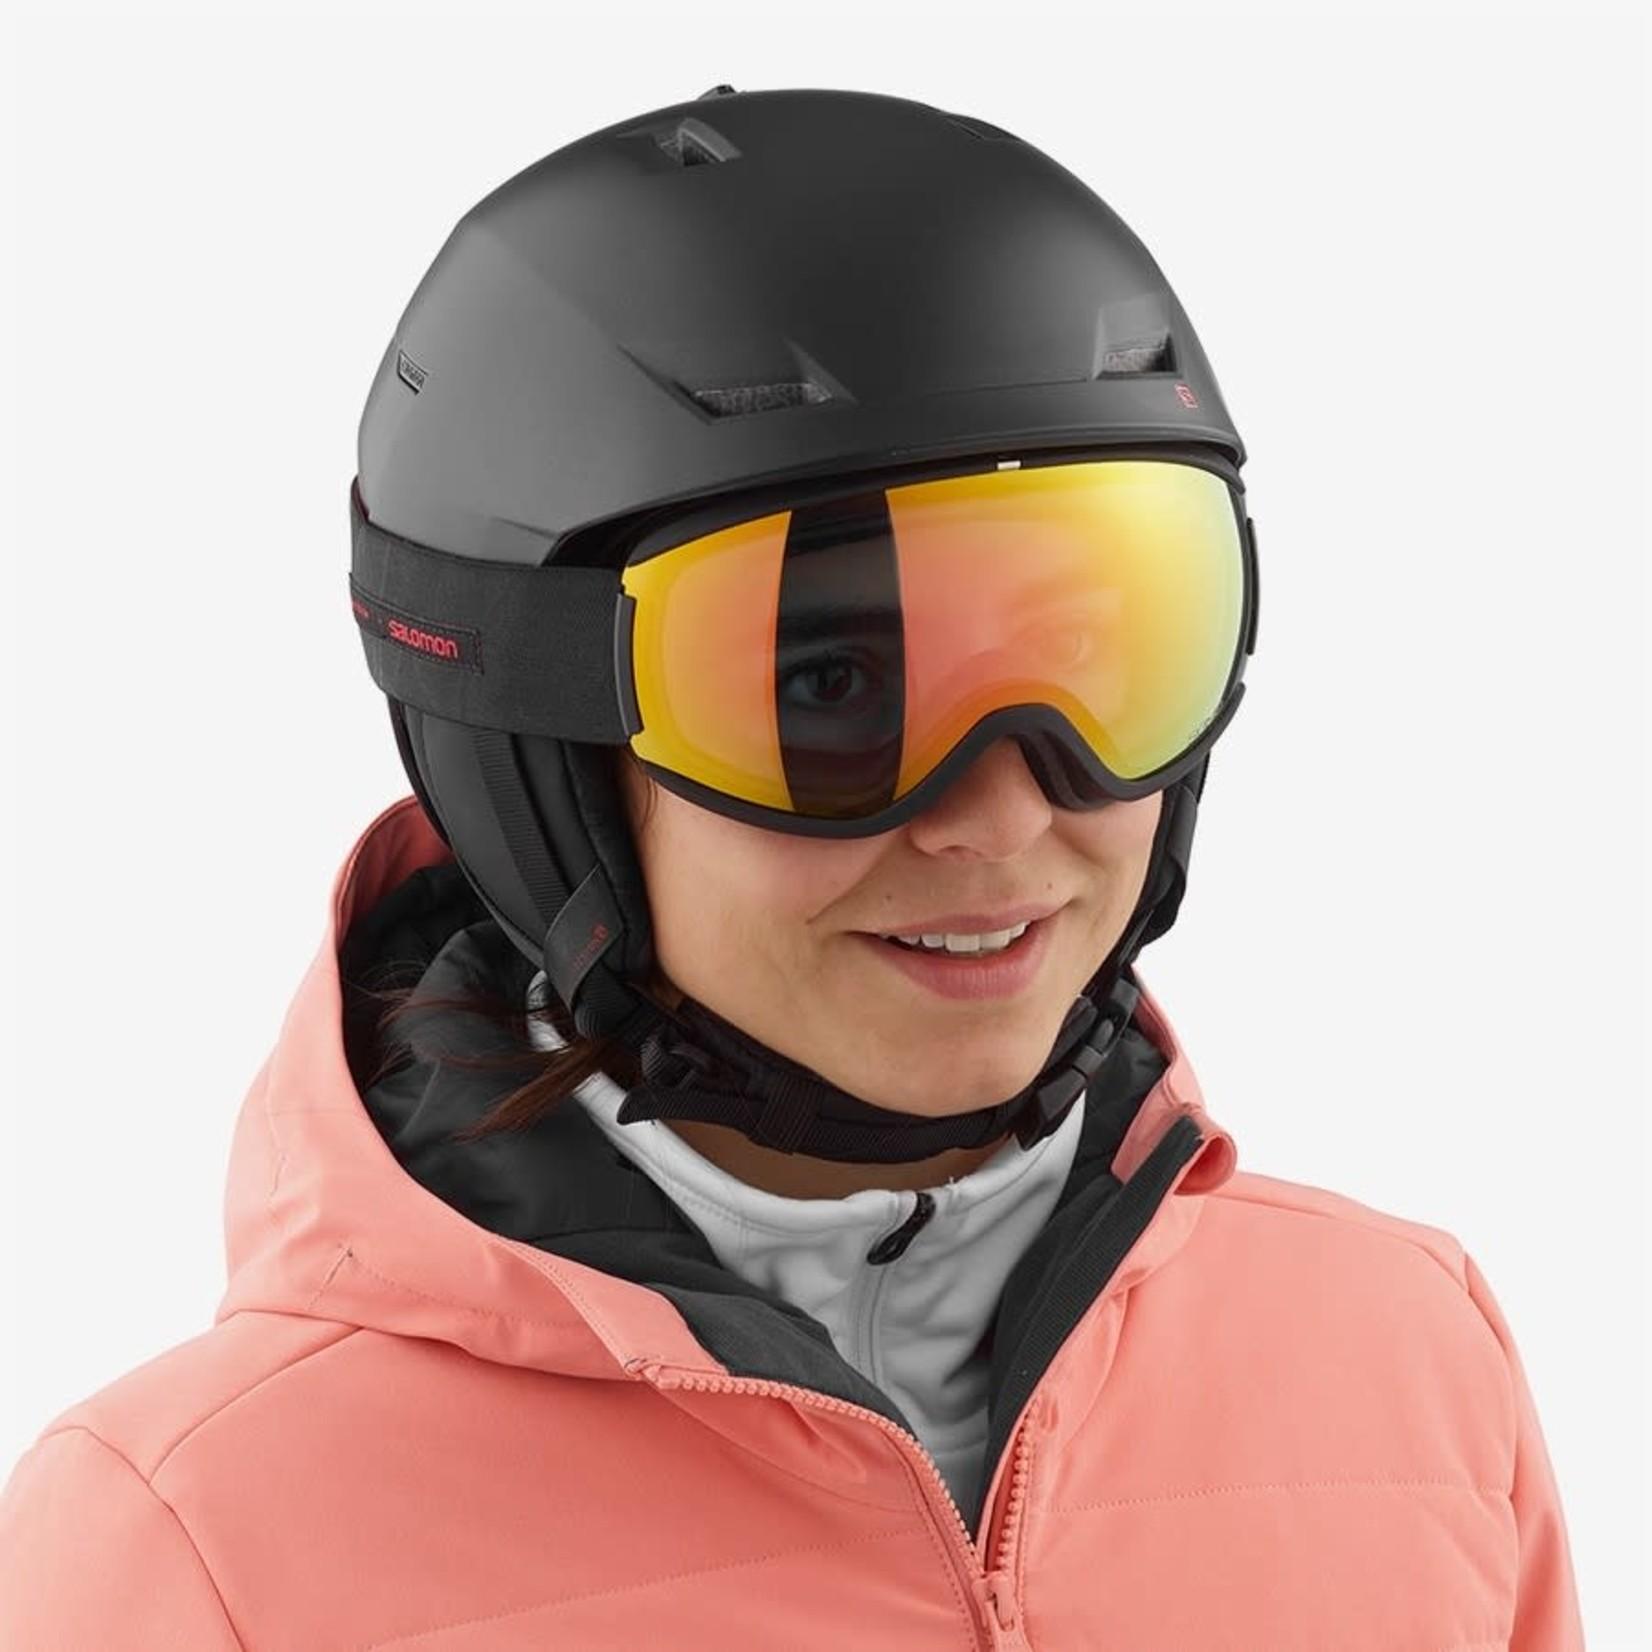 Salomon Lunette de ski Salomon Ivy Photochromatic - Femme